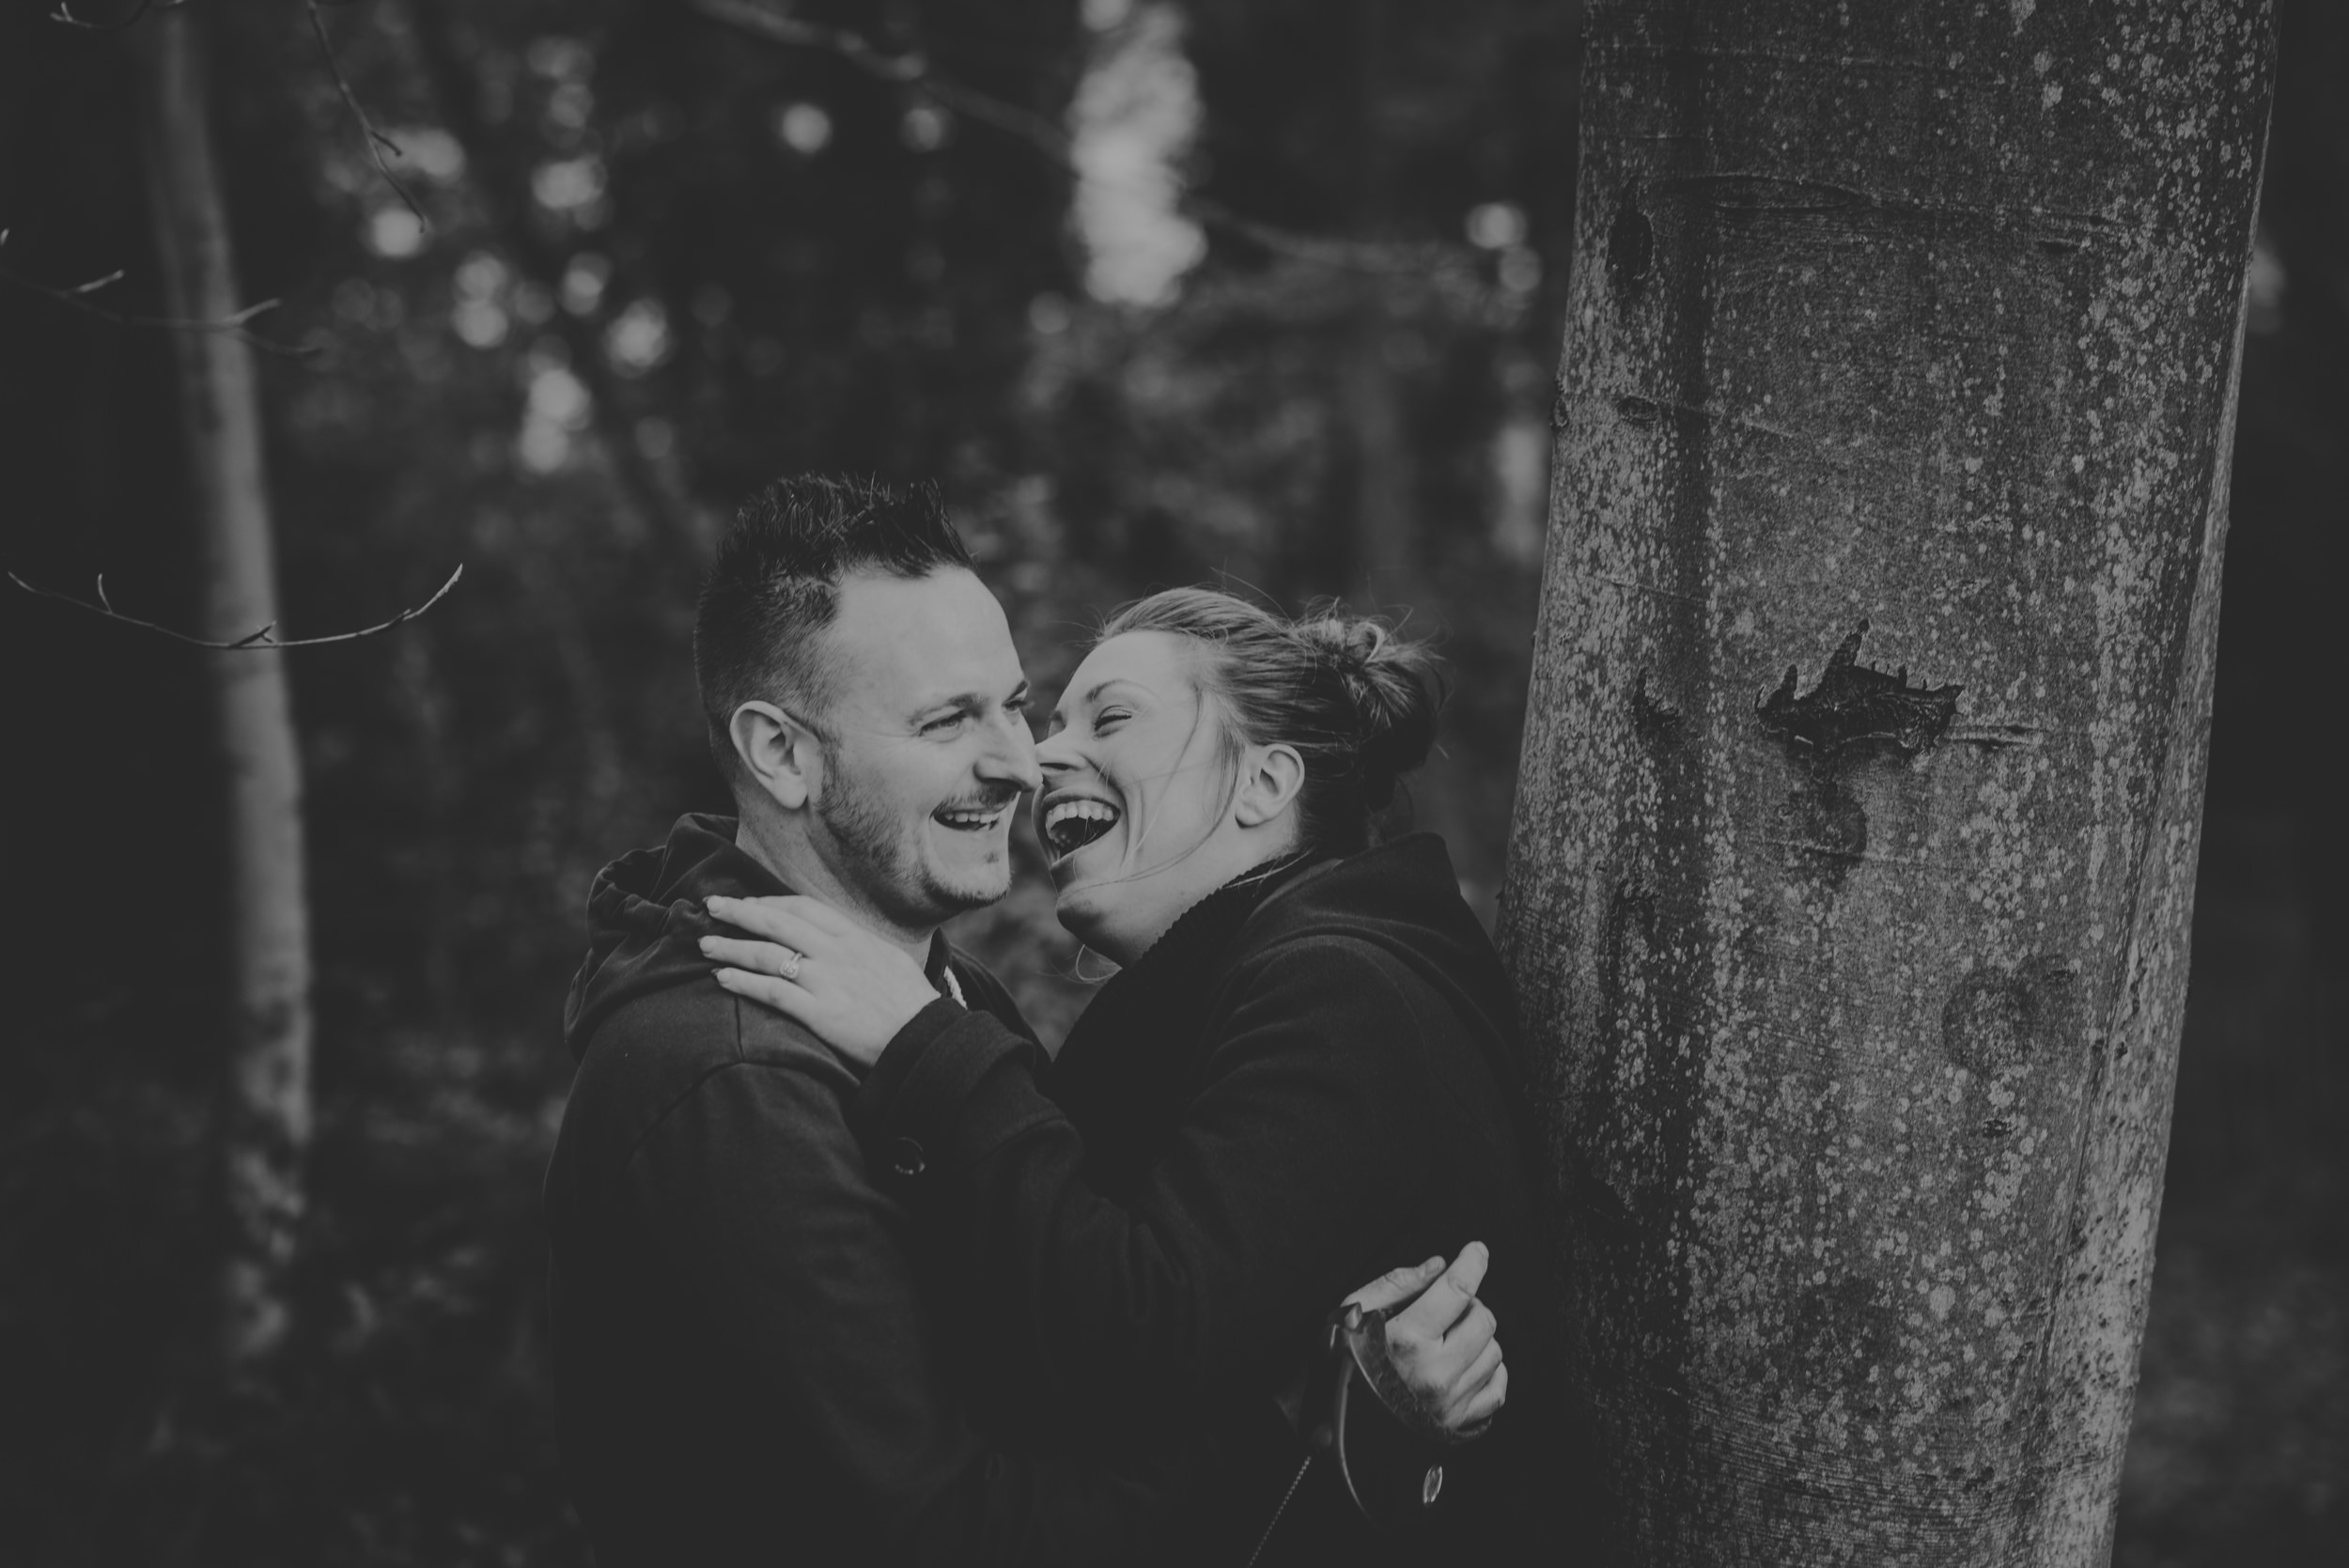 Hannah-and-Sam-Engagement-Sesion-in-Fleet-Pond-Hampshire-Manu-Mendoza-Wedding-Photography-023.jpg